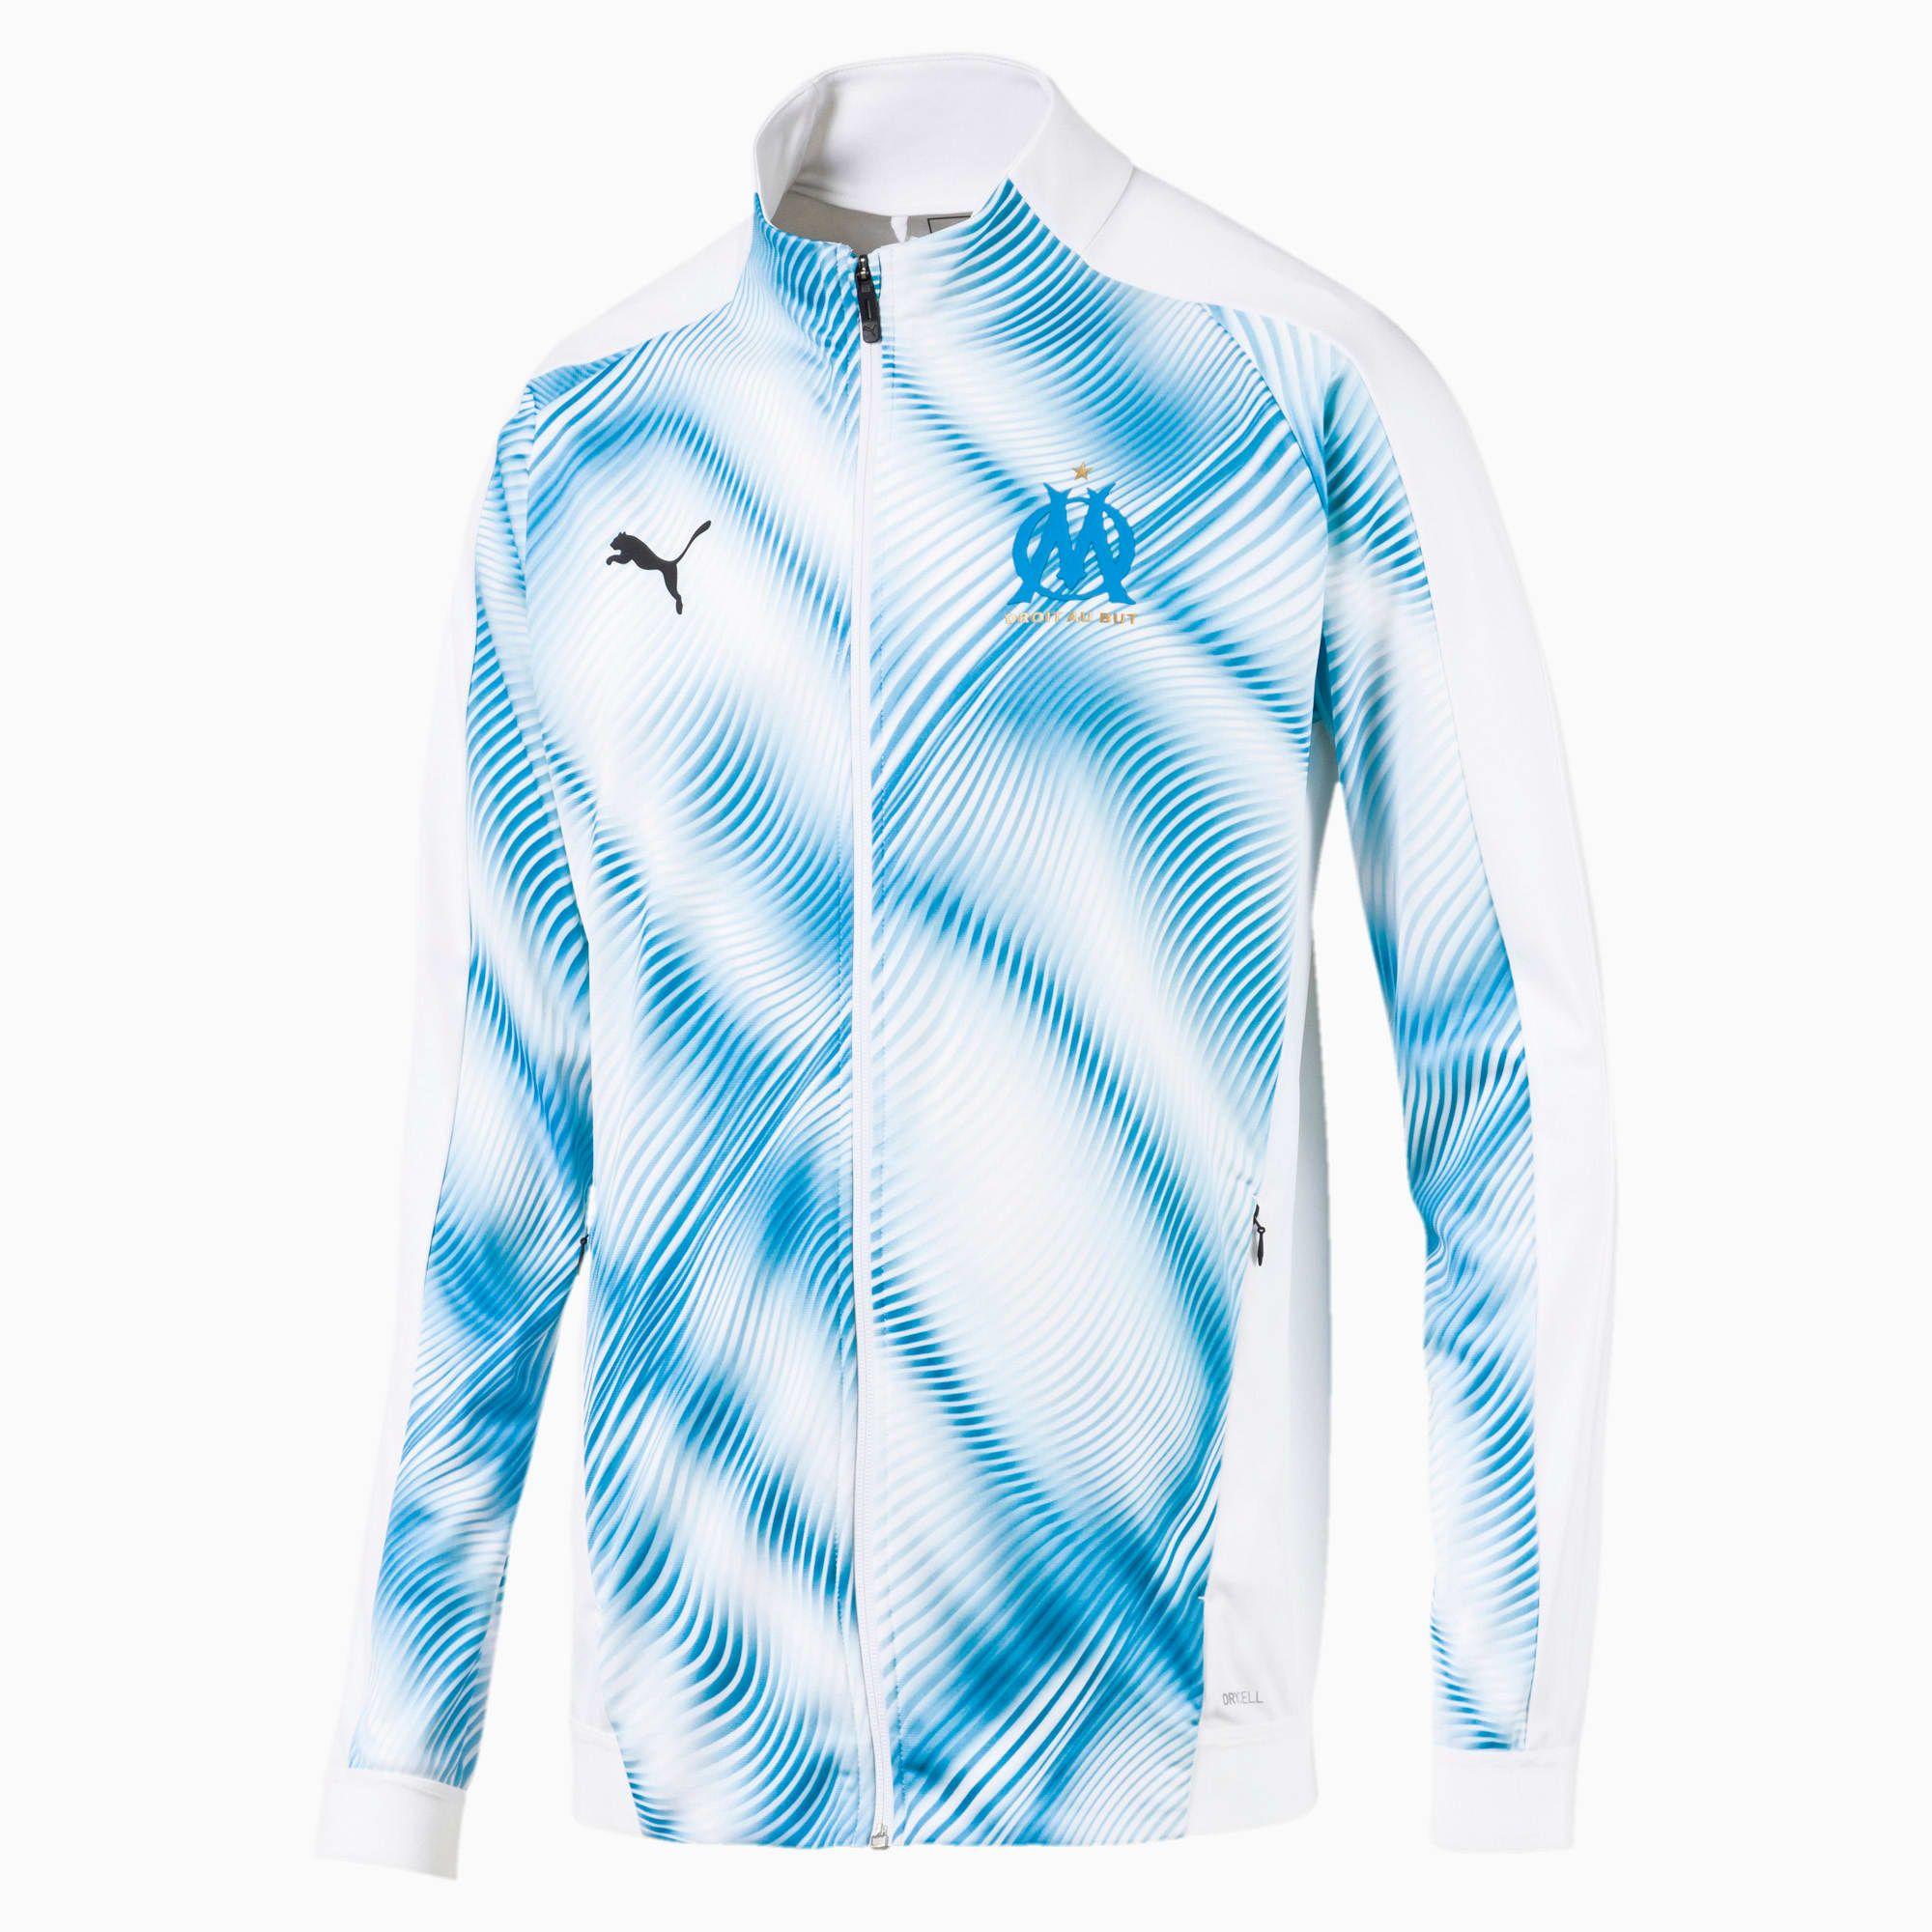 PUMA Olympique De Marseille Stadium Men's Jacket, White/Azure, size Small, Clothing